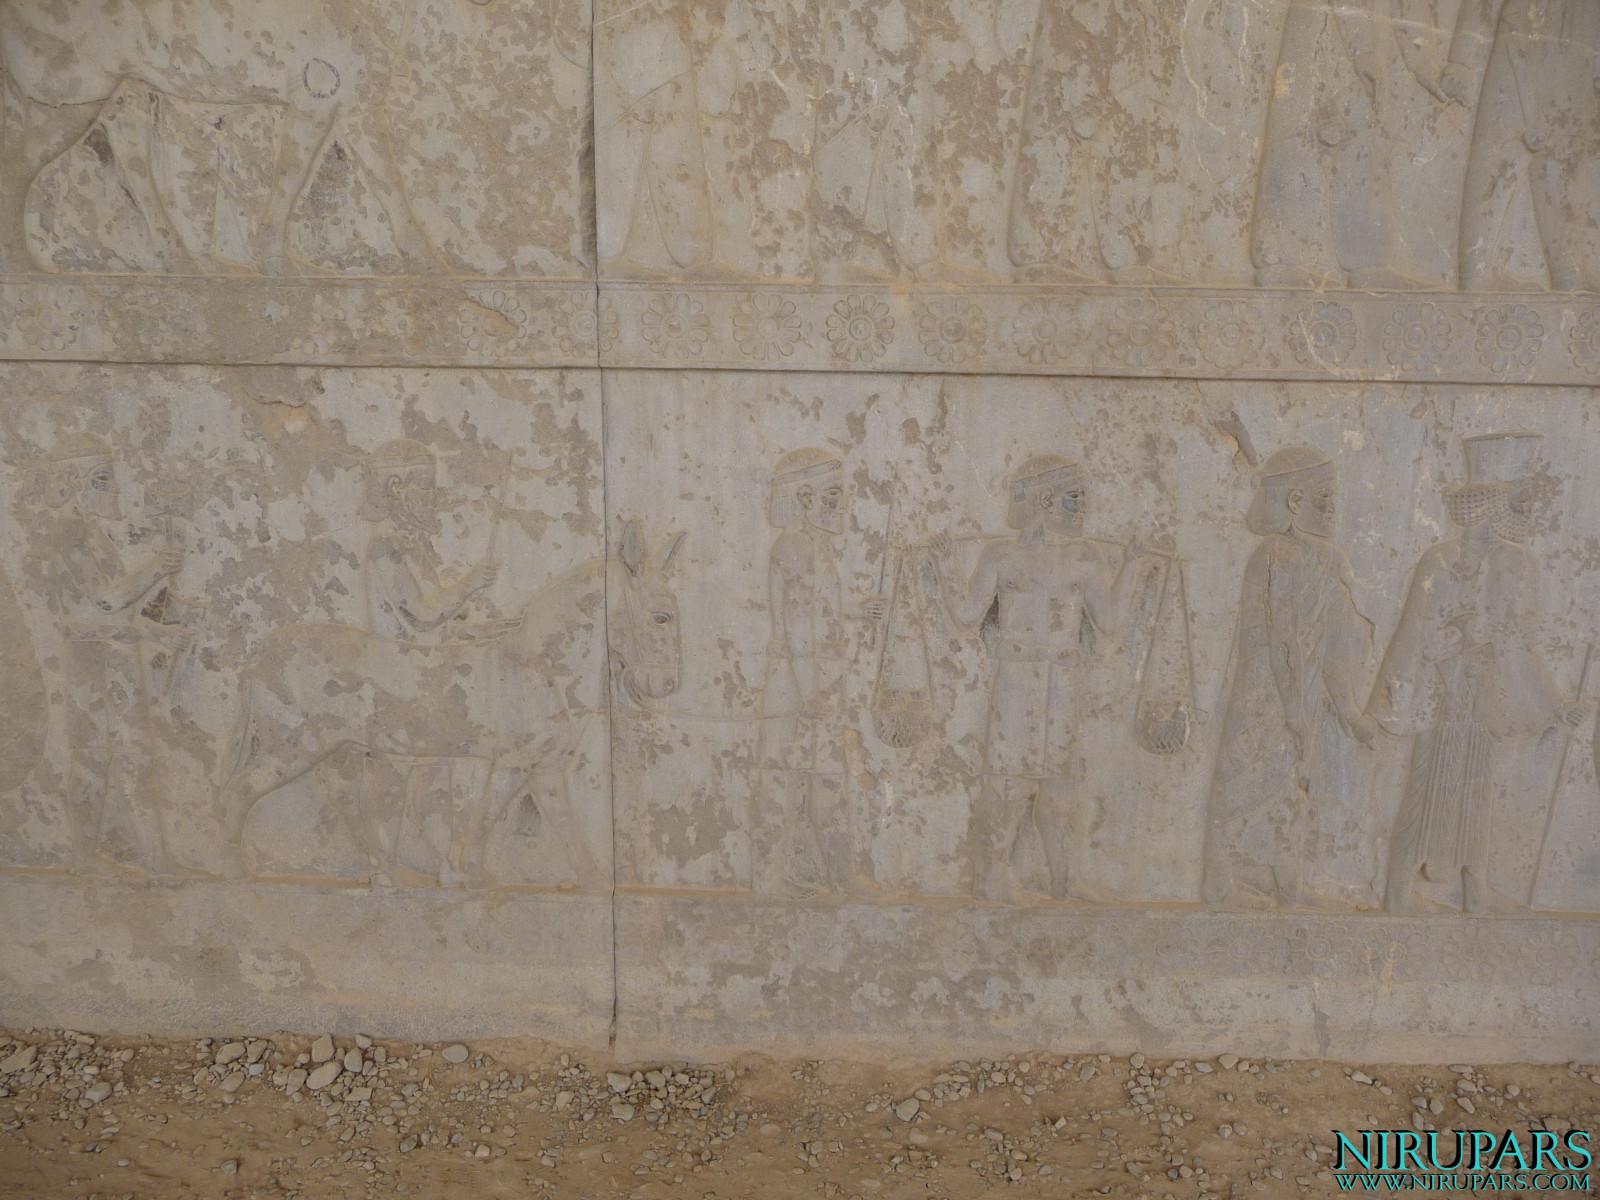 Persepolis - Apadana - East Portico - Delegation India